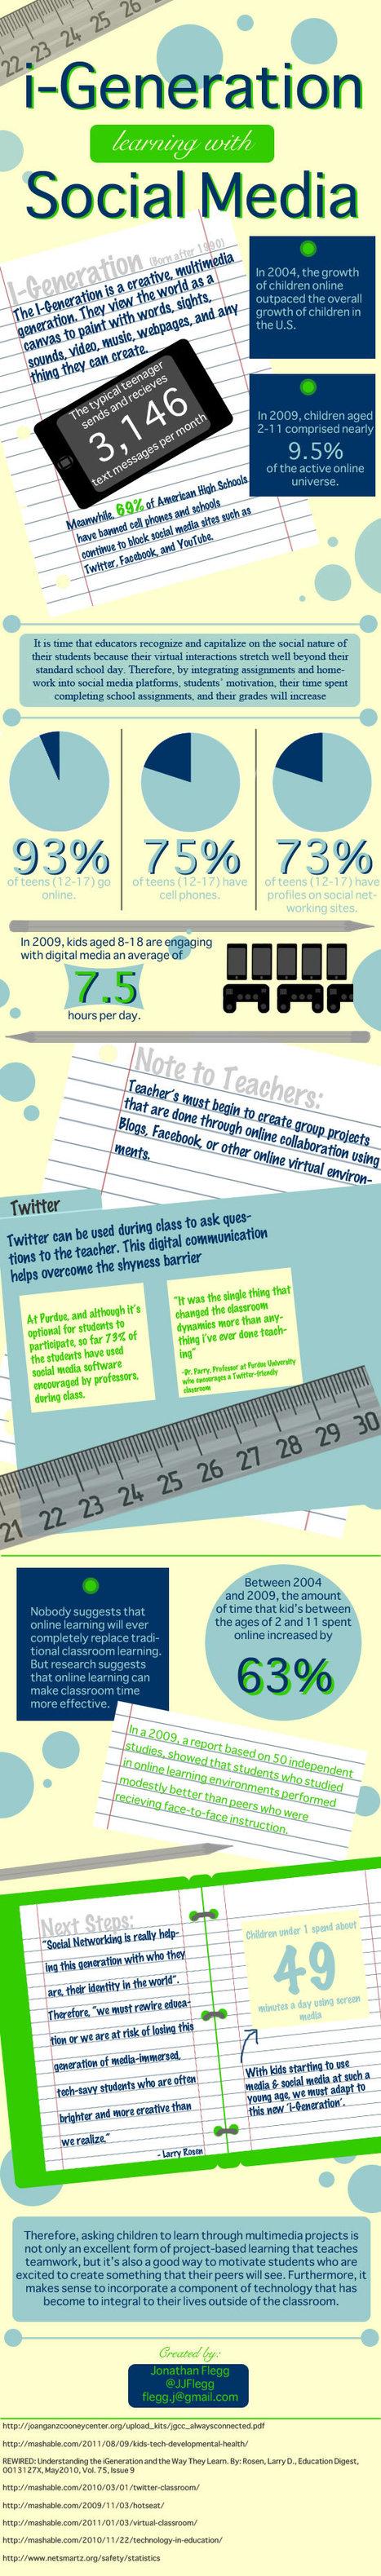 Social media. All the kids are doing it. | Aprendiendo a Distancia | Scoop.it